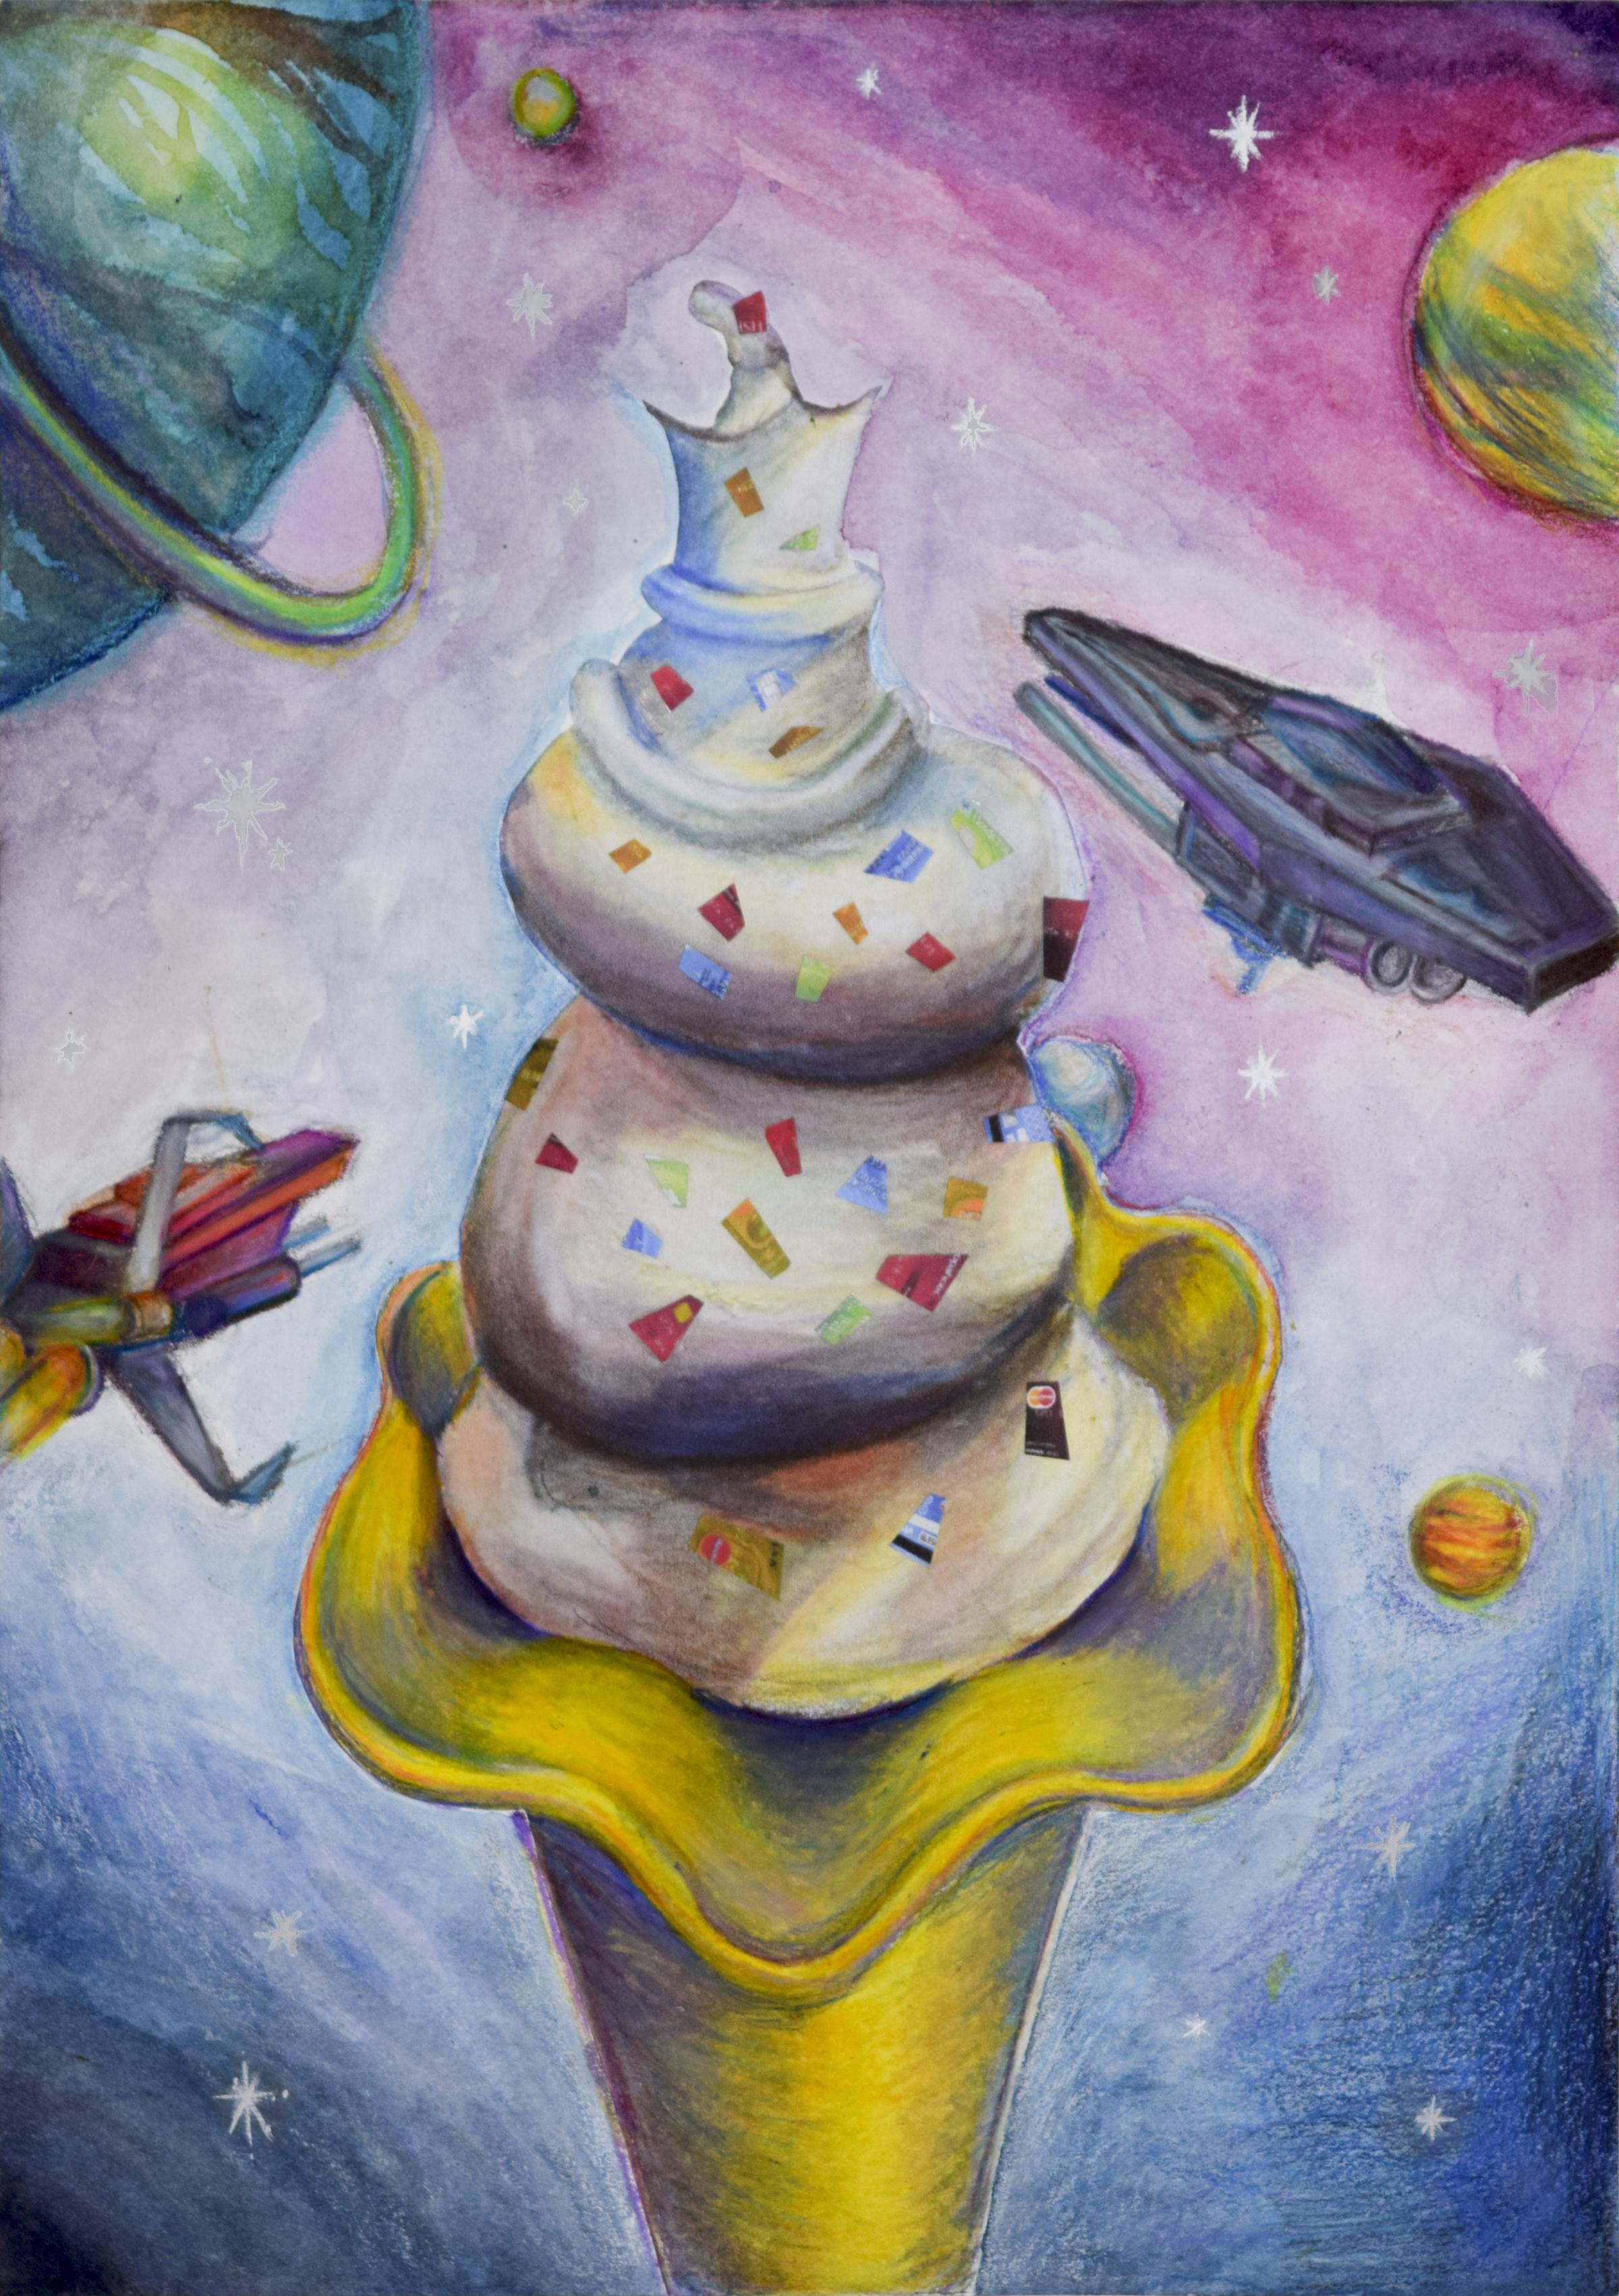 Icecream_Tastes_Like_the_Galaxy